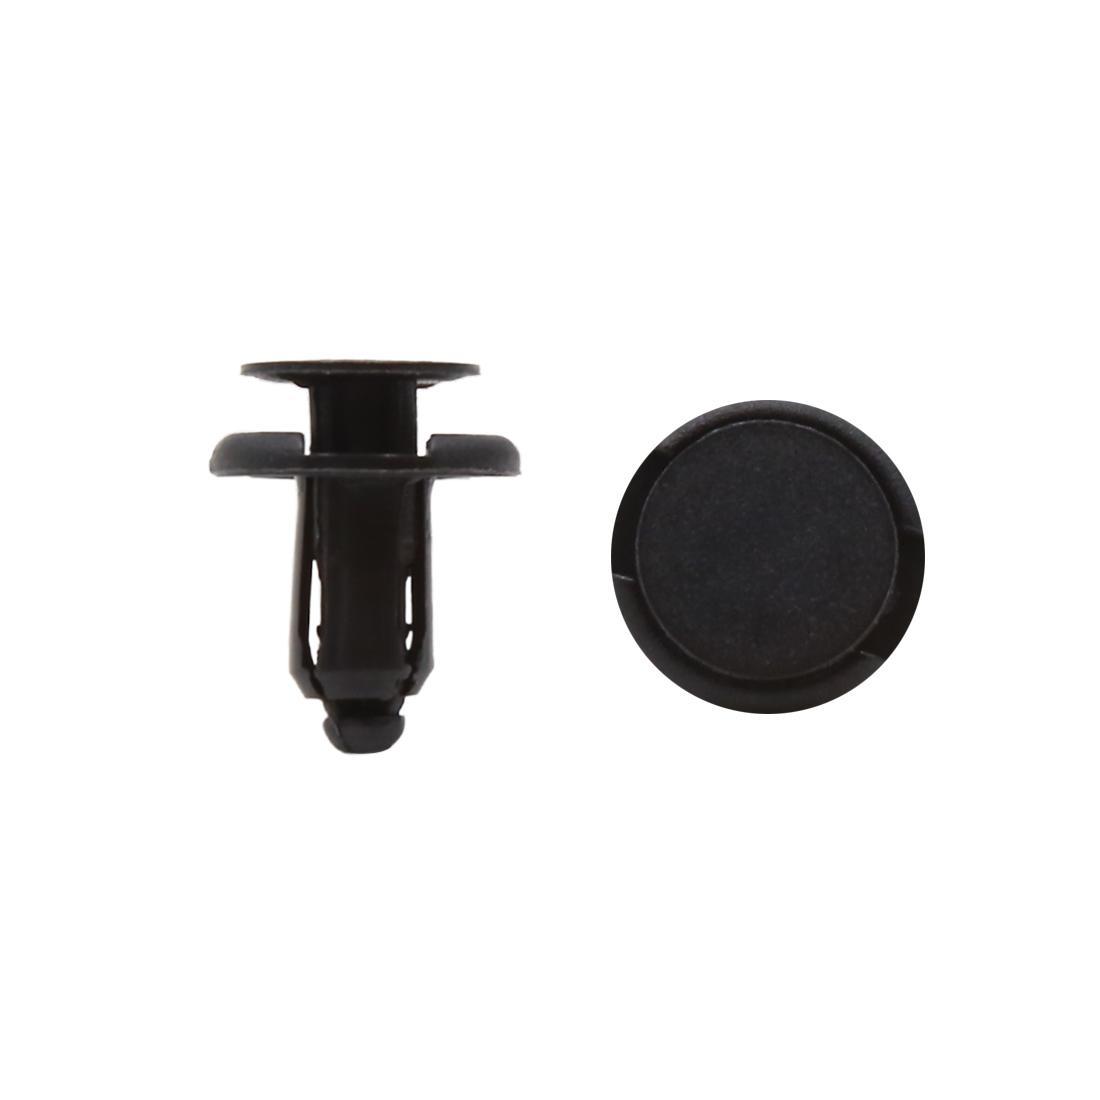 50pcs 8mm Hole 17.5mm Head Plastic Rivets Fastener Push Clips Black for Car